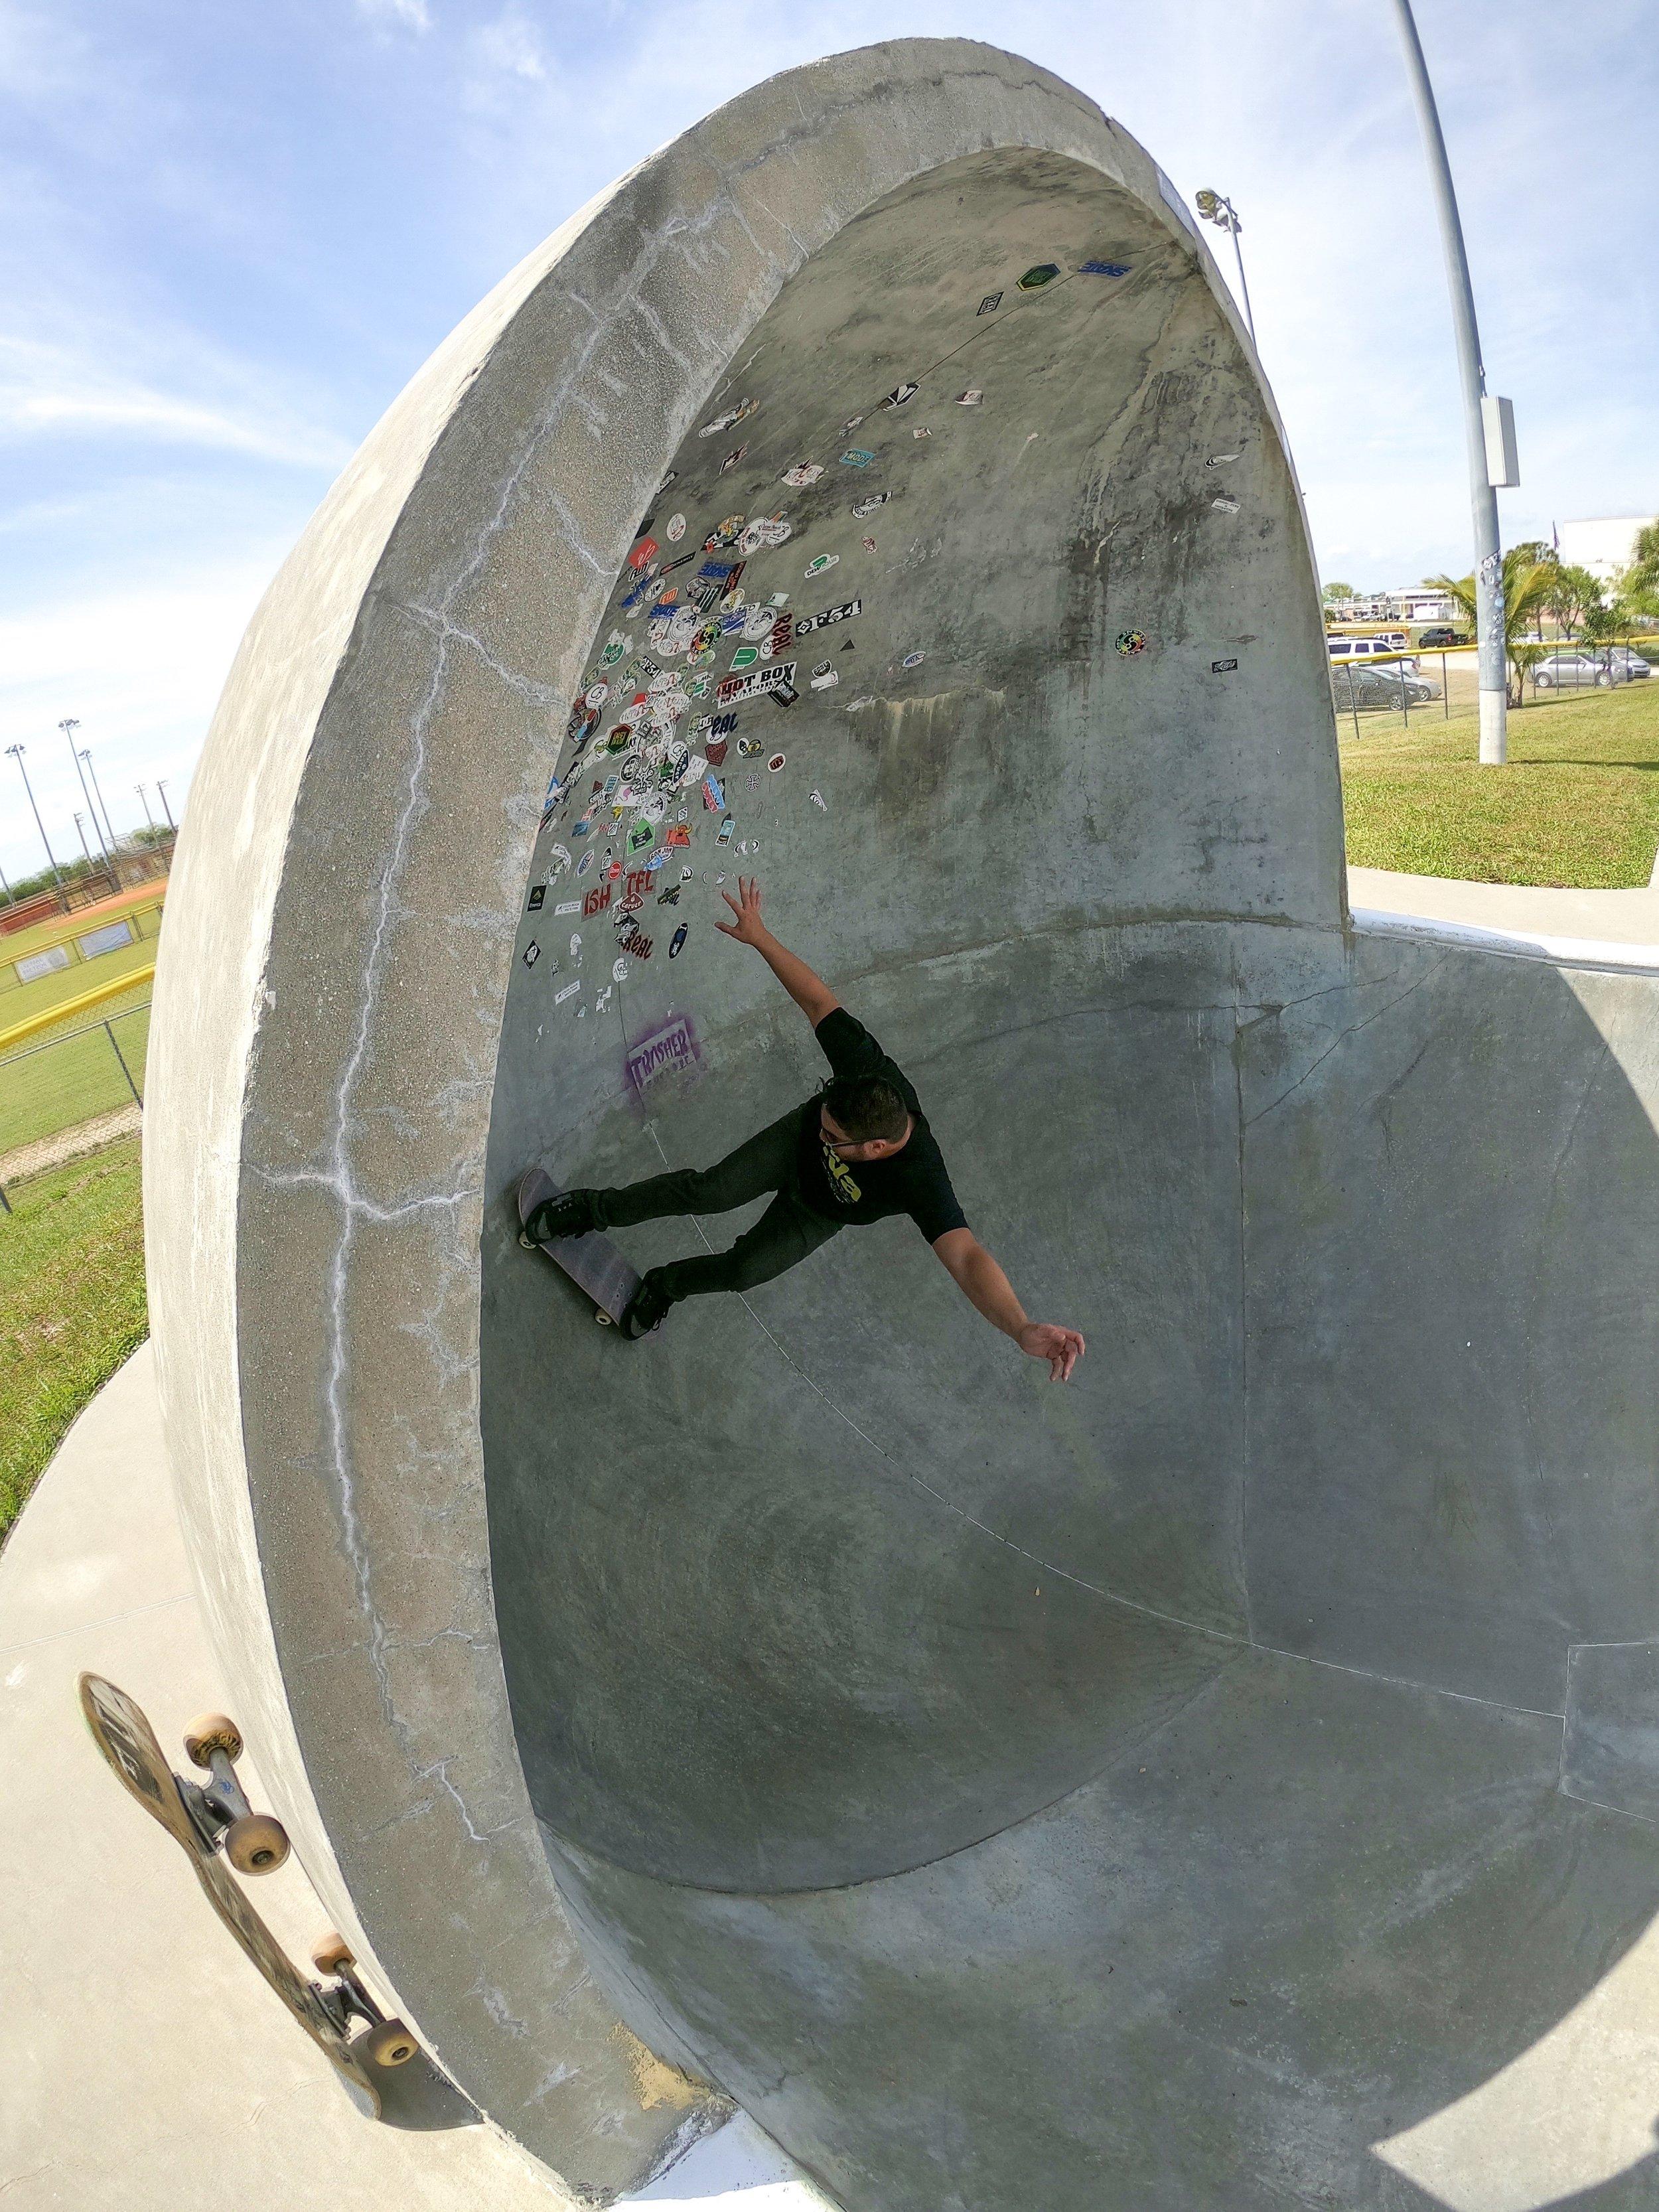 Half-Pipe-Skateboard-Chris_Kernstock.jpeg